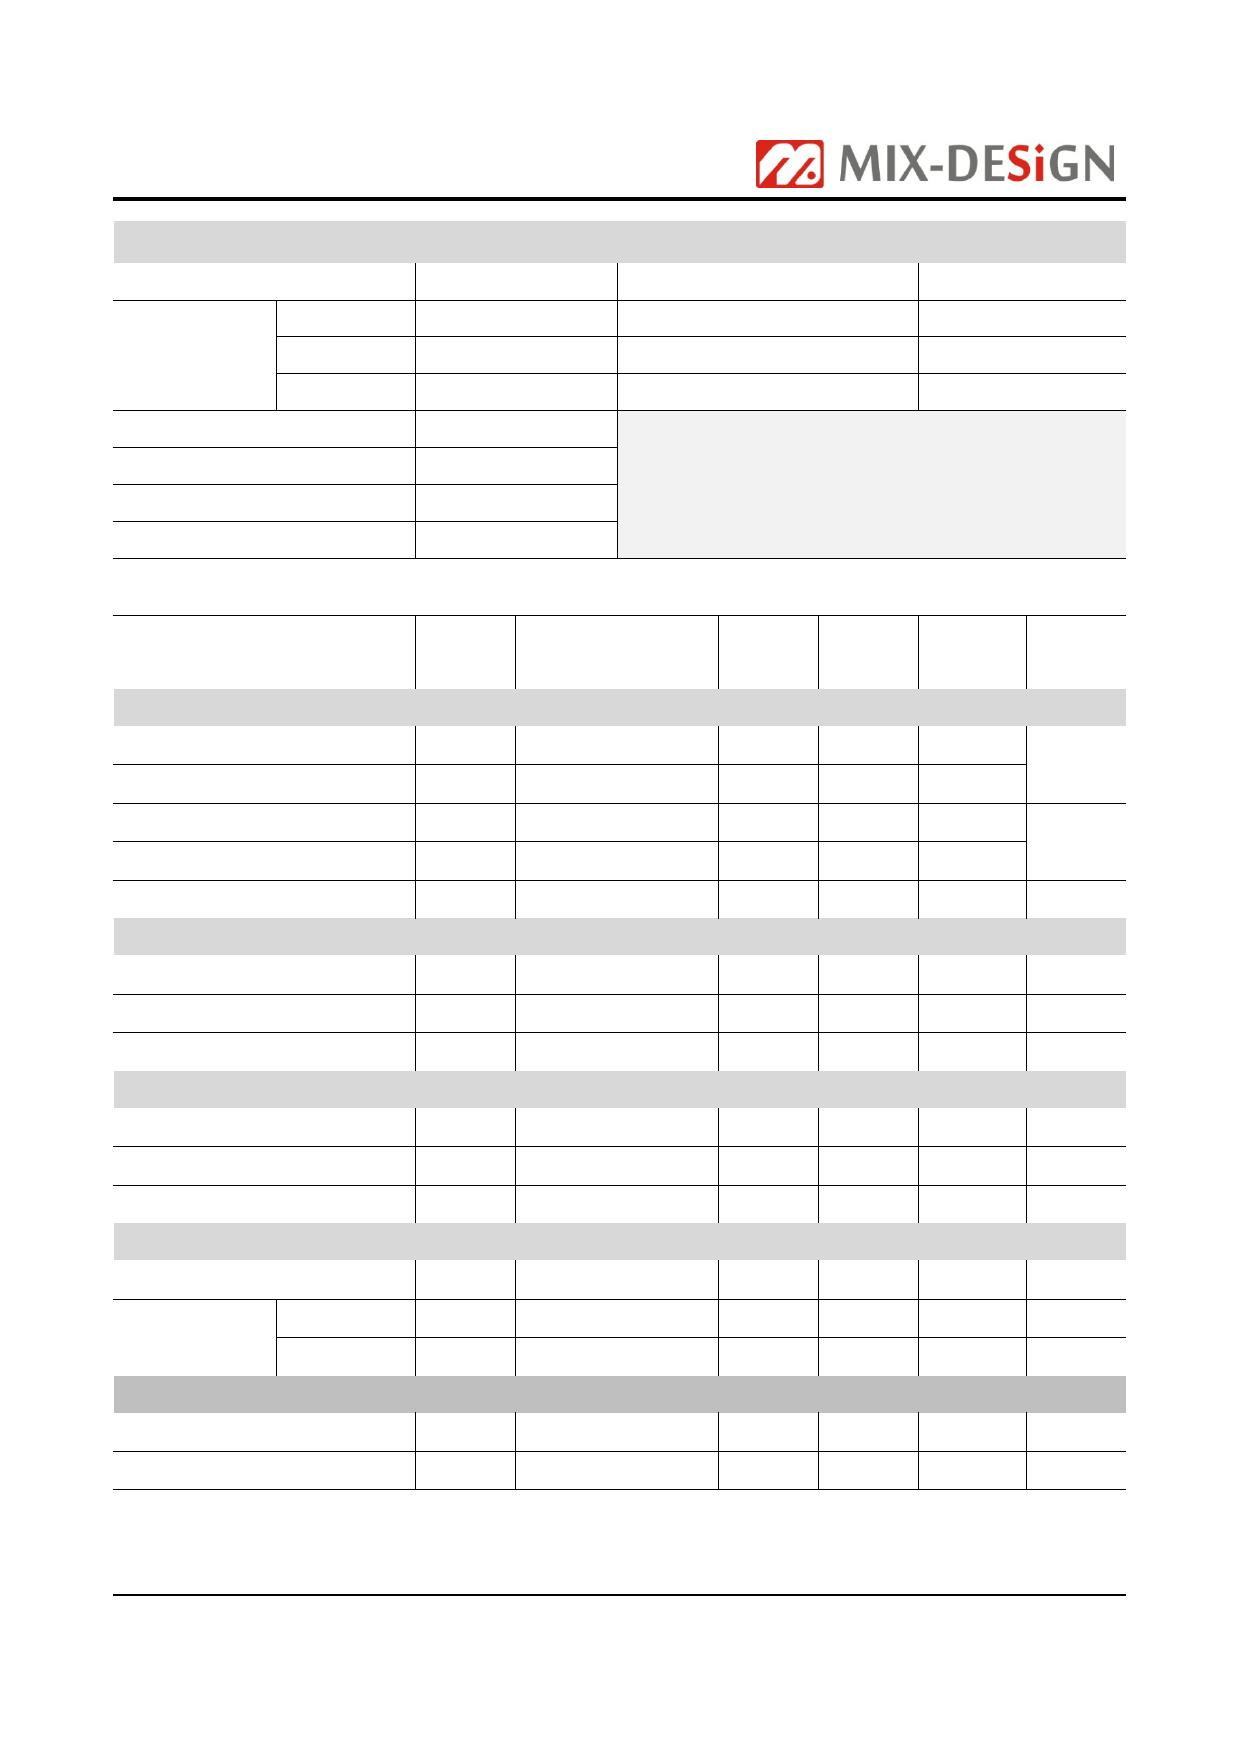 MD1801 pdf, 반도체, 판매, 대치품